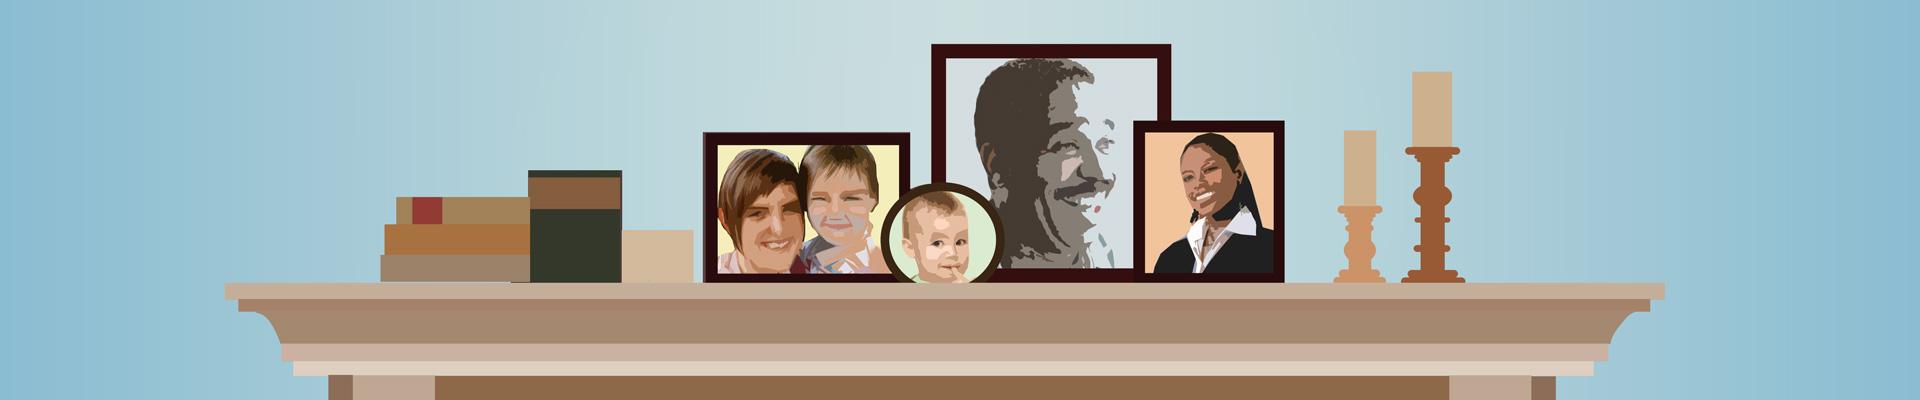 Family and Friends   iZONE